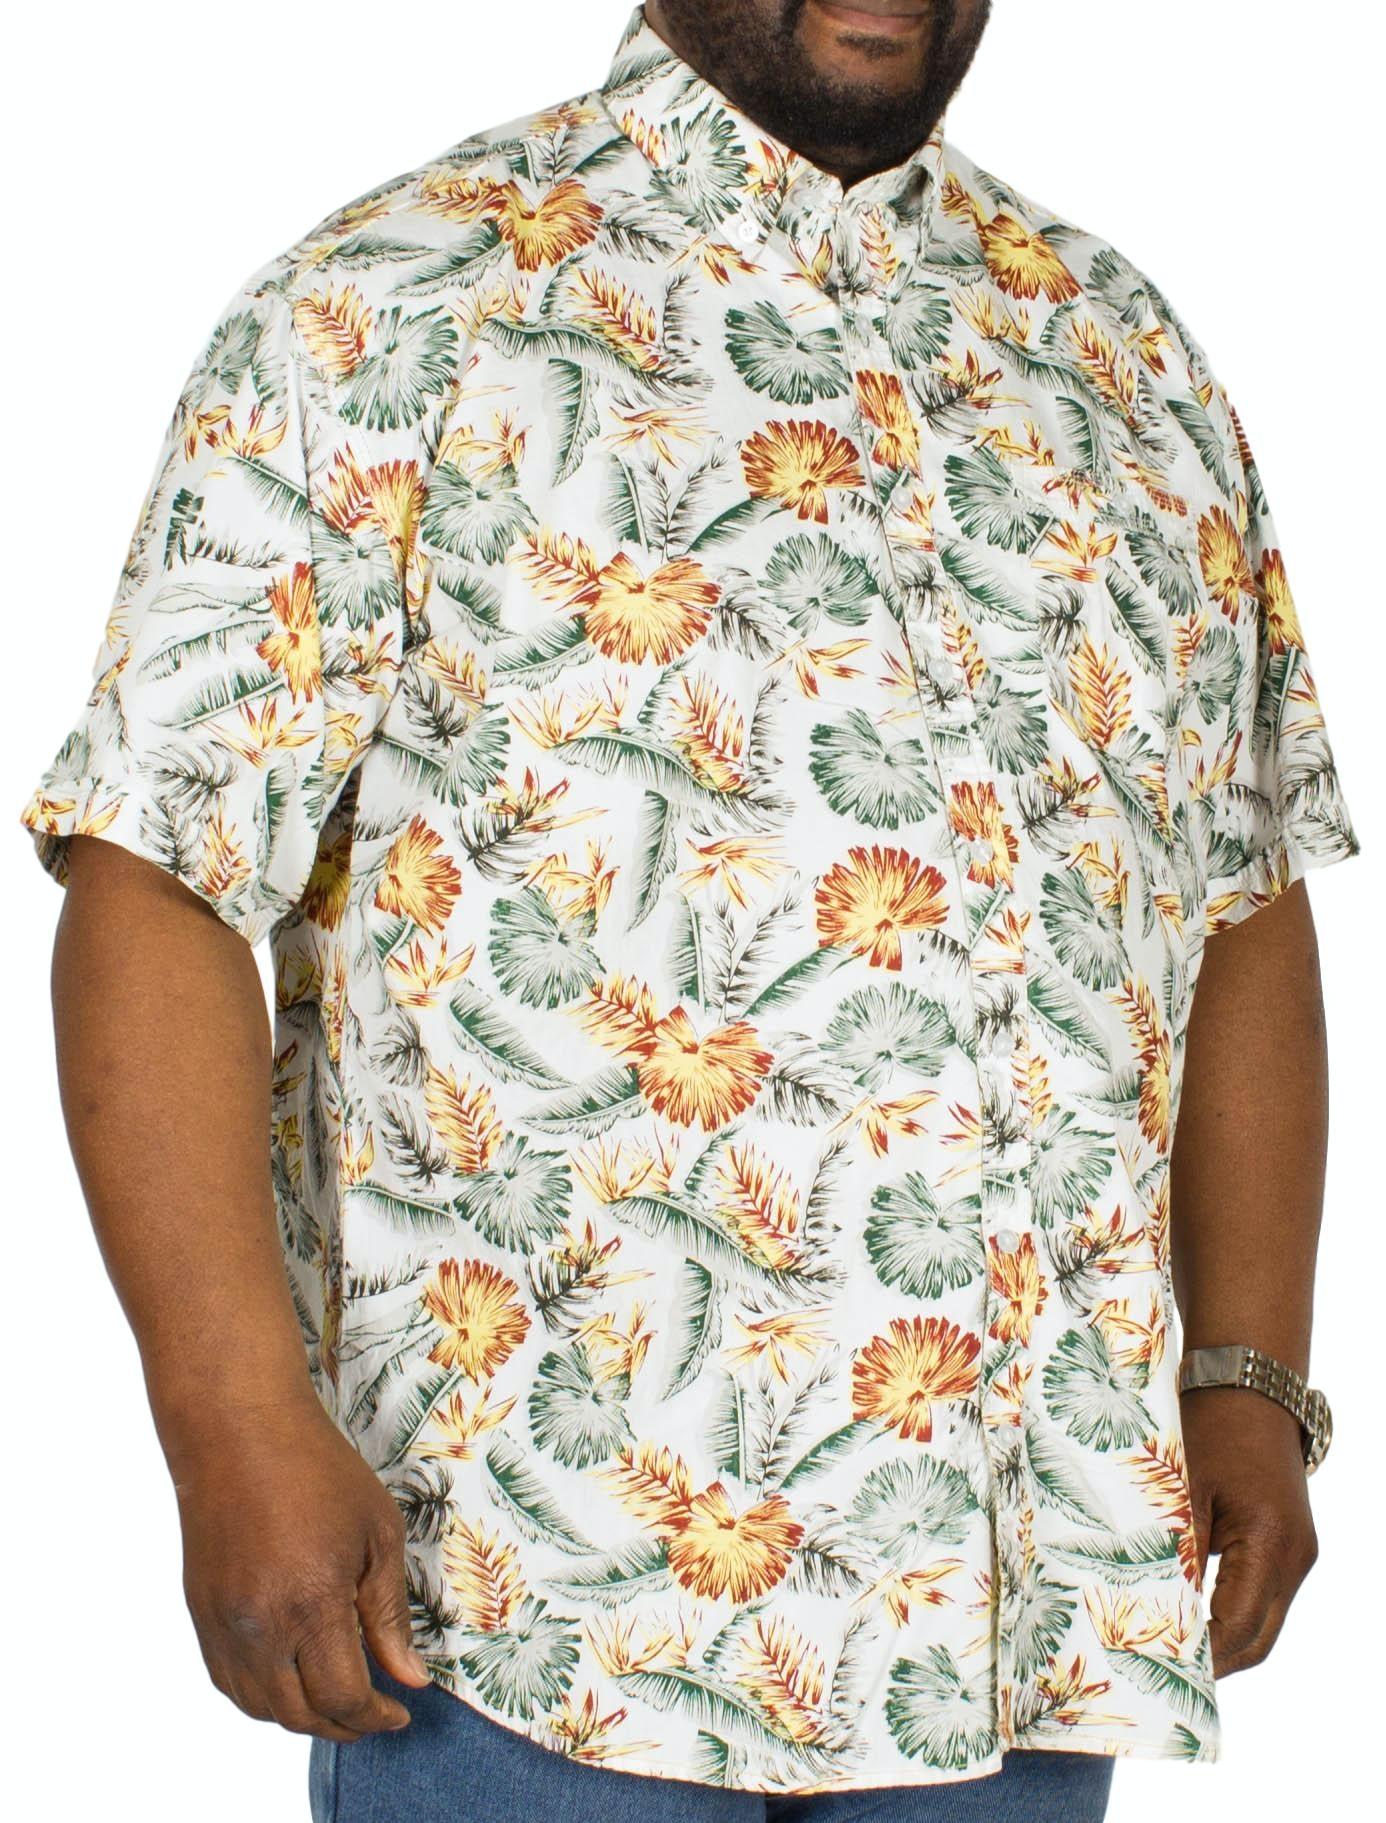 Espionage All Over Print Floral Shirt Green/Orange